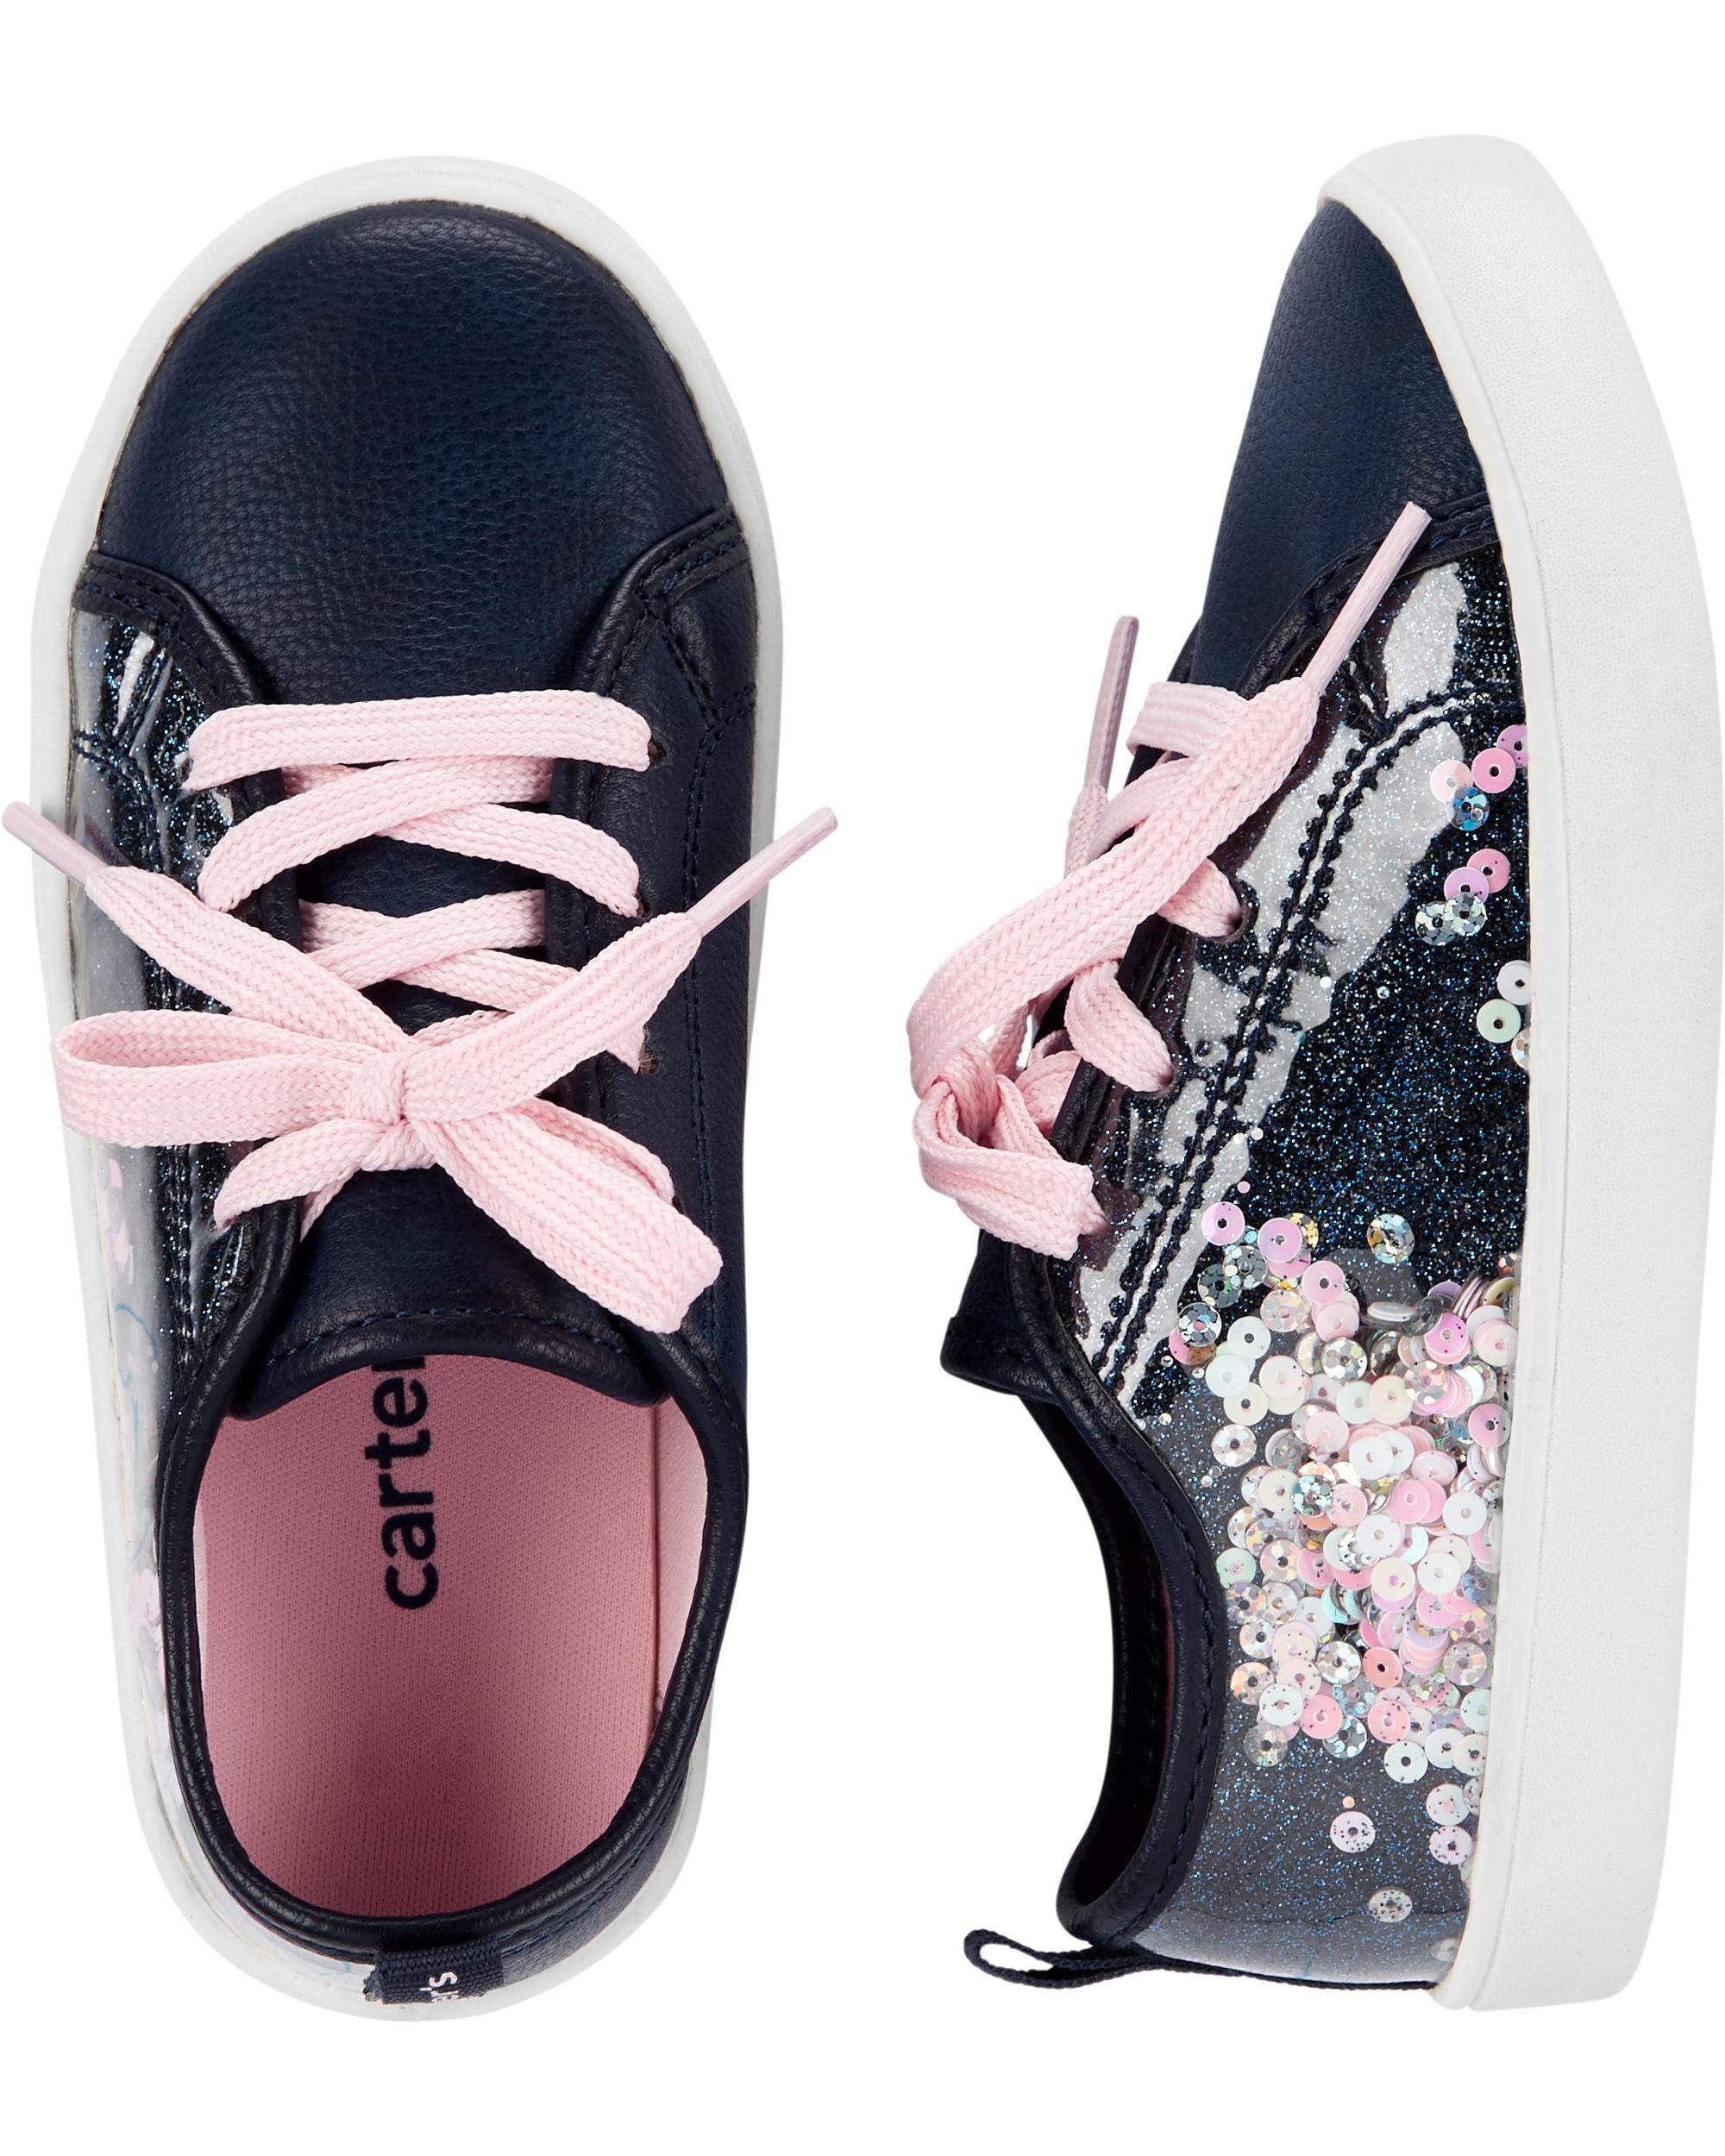 Carter's Shake Sequin Casual Sneakers